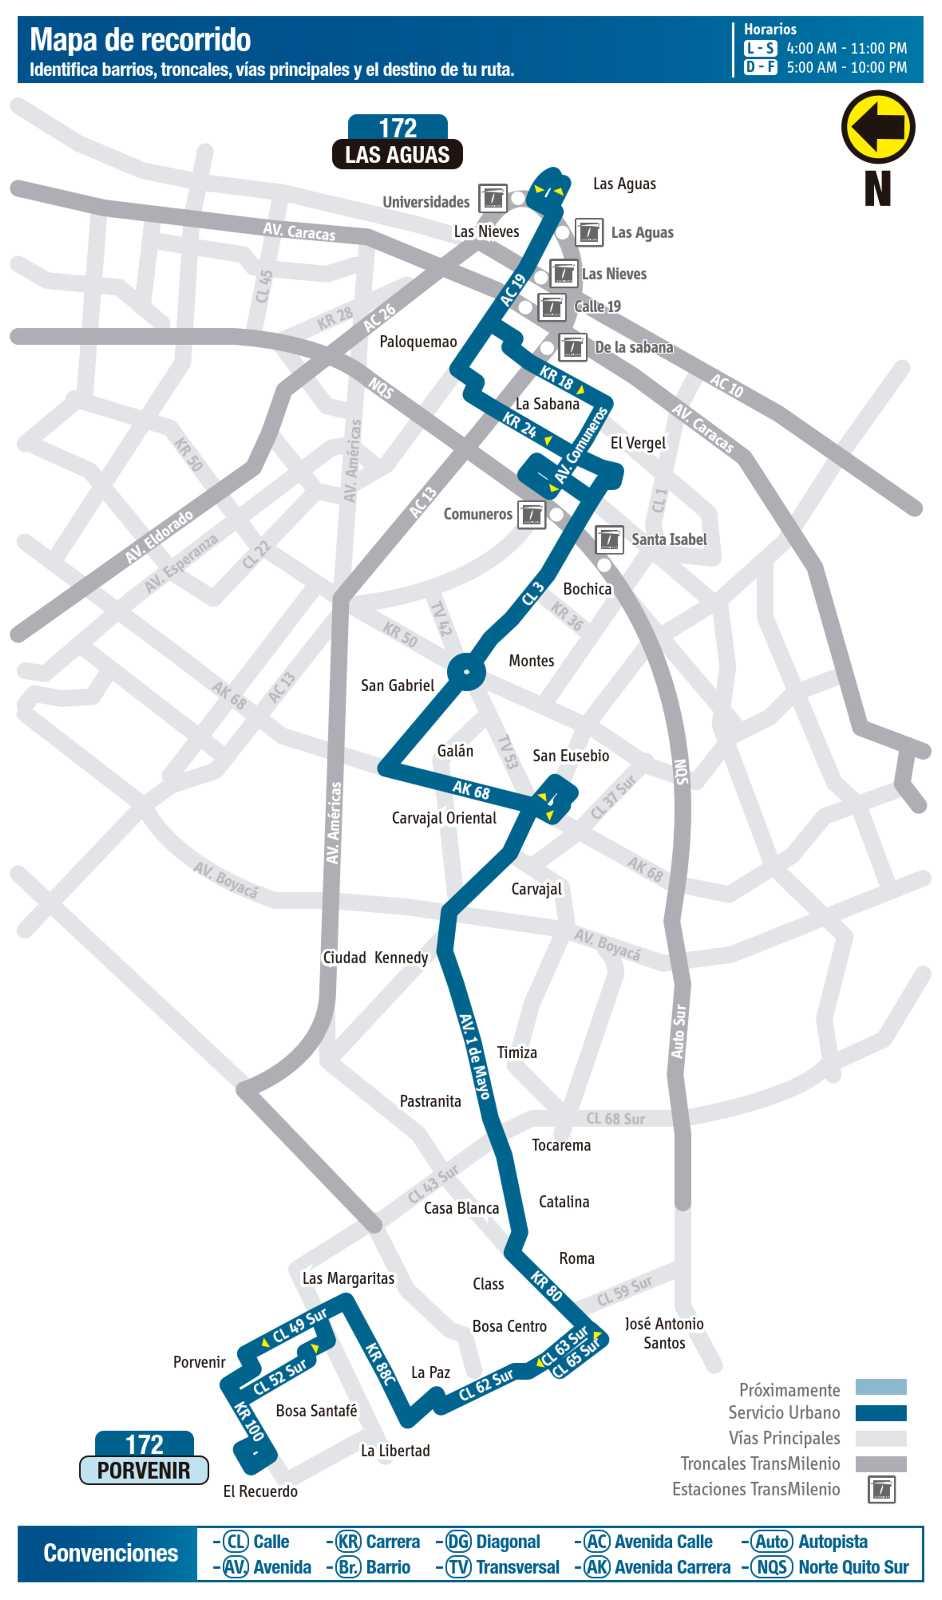 Ruta SITP: 172: Paloquemao ↔ Porvenir (mapa)